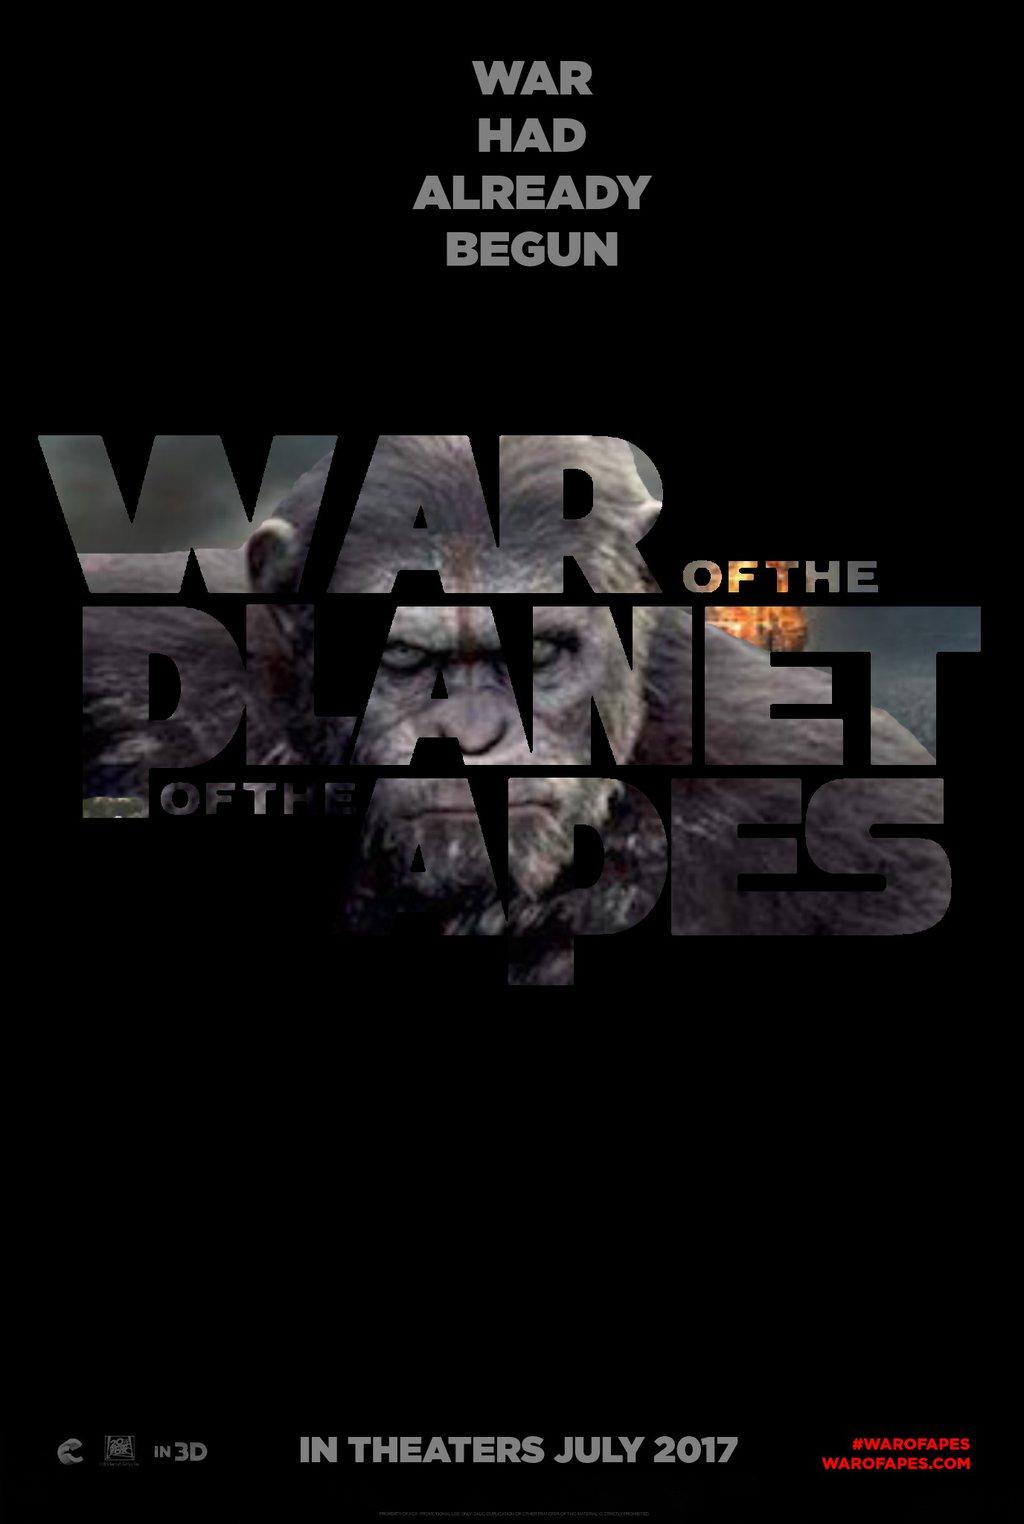 دانلود زیرنویس فارسی فیلم War for the Planet of the Apes 2017